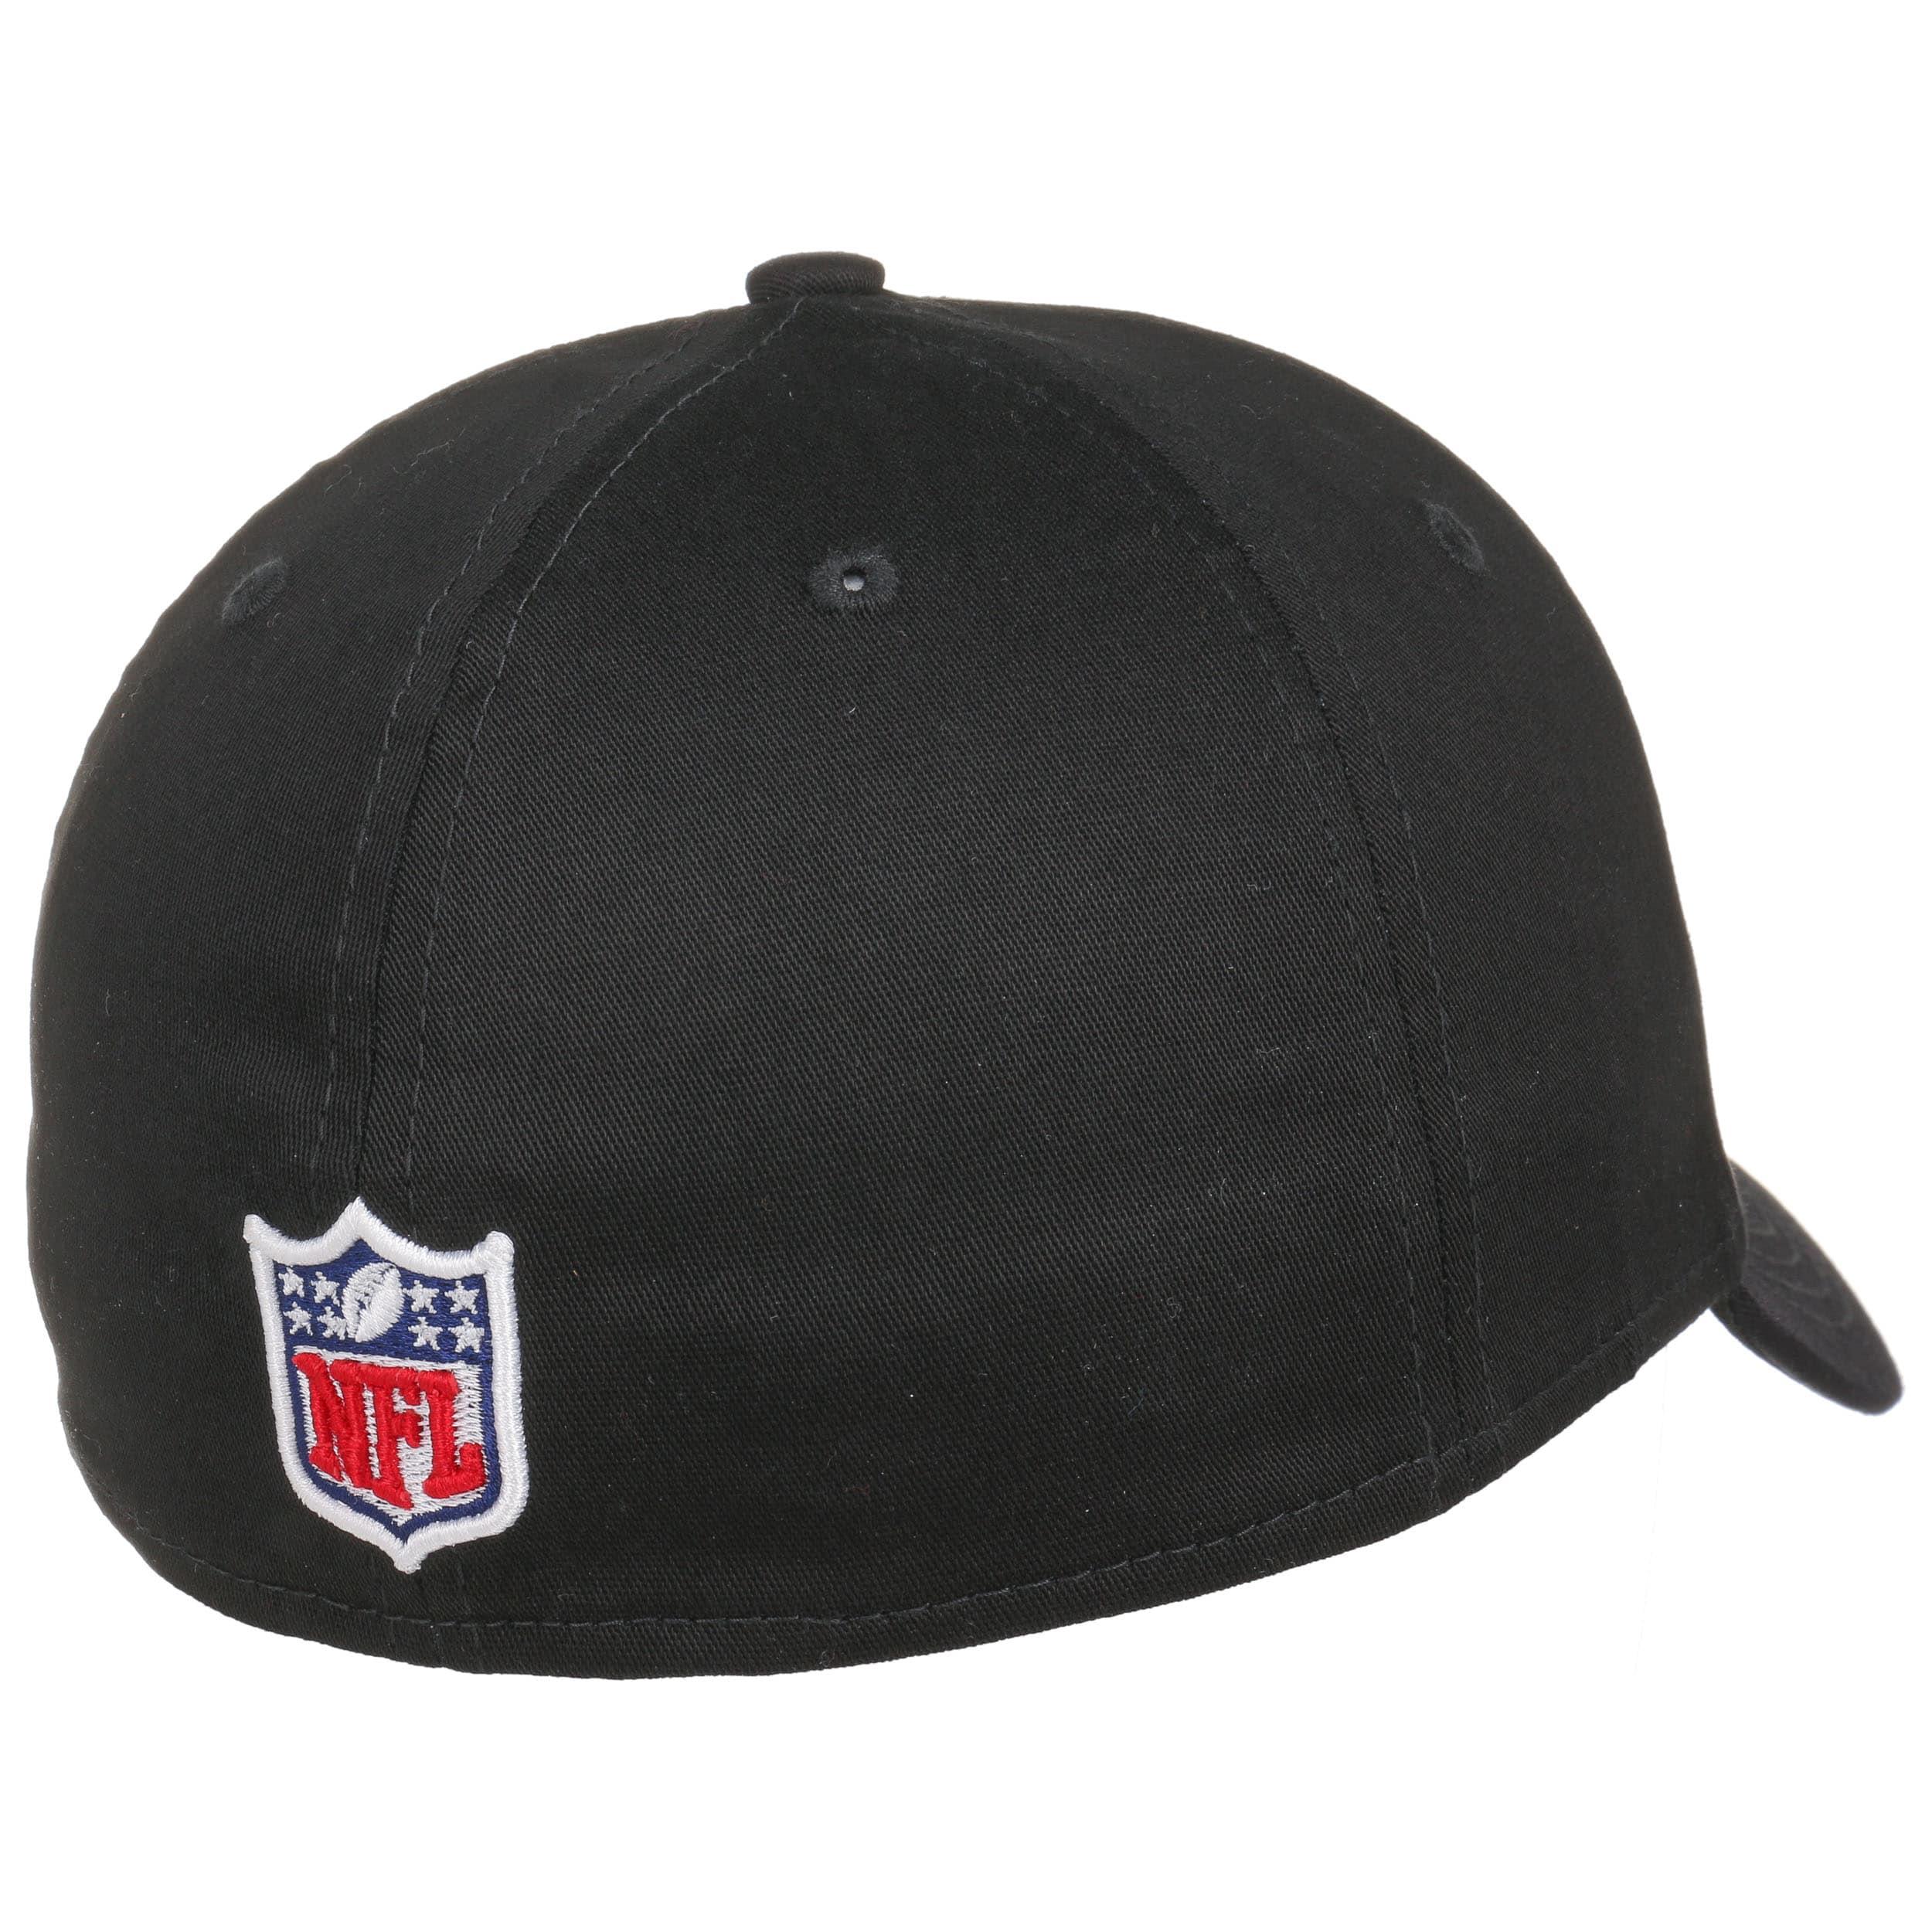 ... 39Thirty Black Base Seahawks Cap by New Era - black 3 ... 1efe21e2f